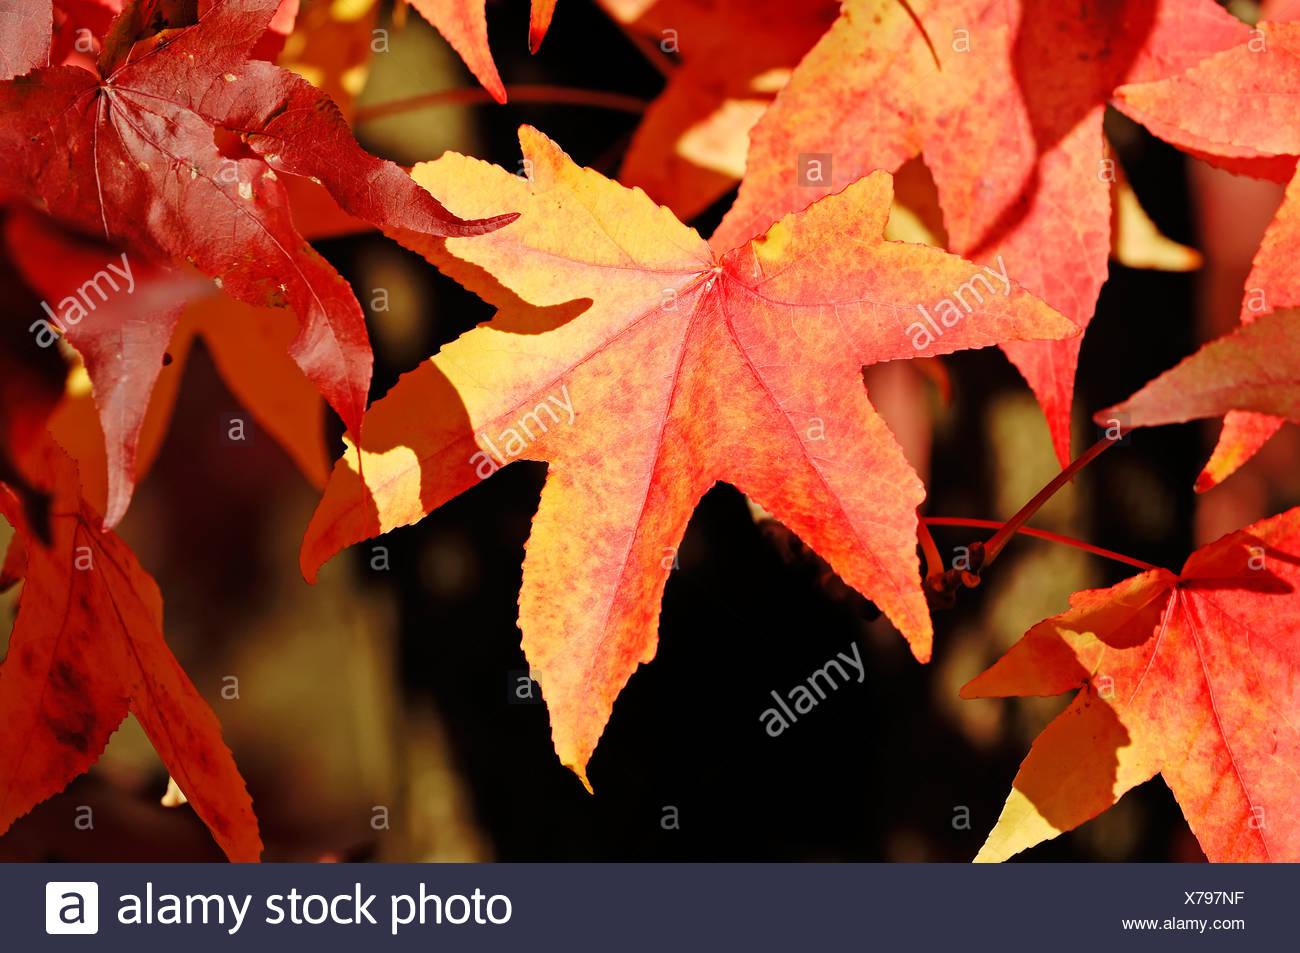 American Sweet Gum, Sweetgum, redgum (Liquidambar styraciflua), leaves in autumn, North Rhine-Westphalia - Stock Image